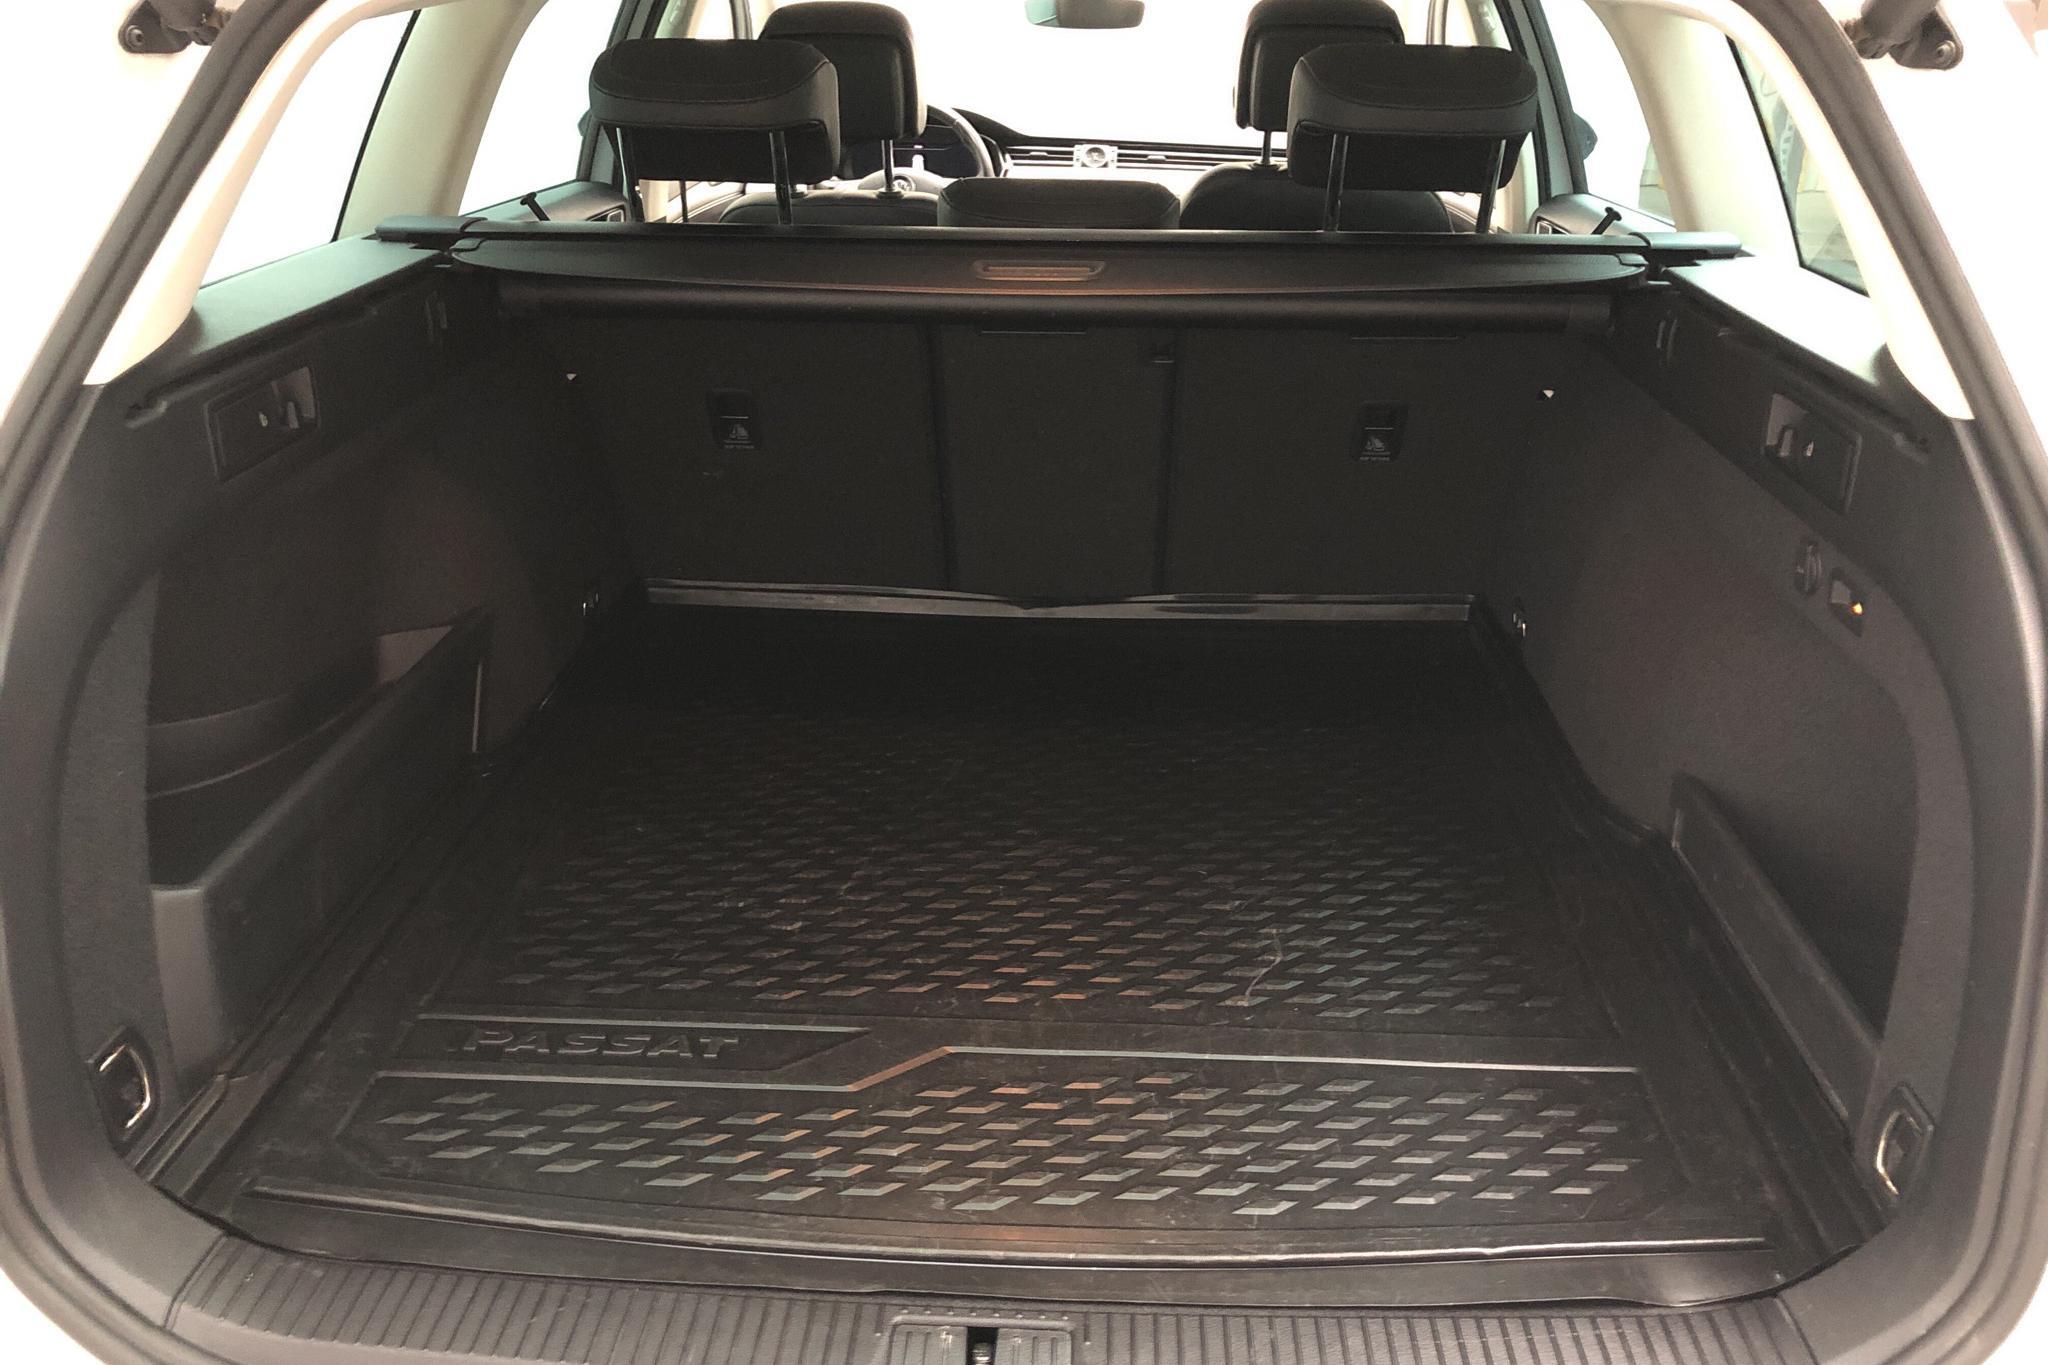 VW Passat 1.4 Plug-in-Hybrid Sportscombi (218hk) - 5 286 mil - Automat - vit - 2019